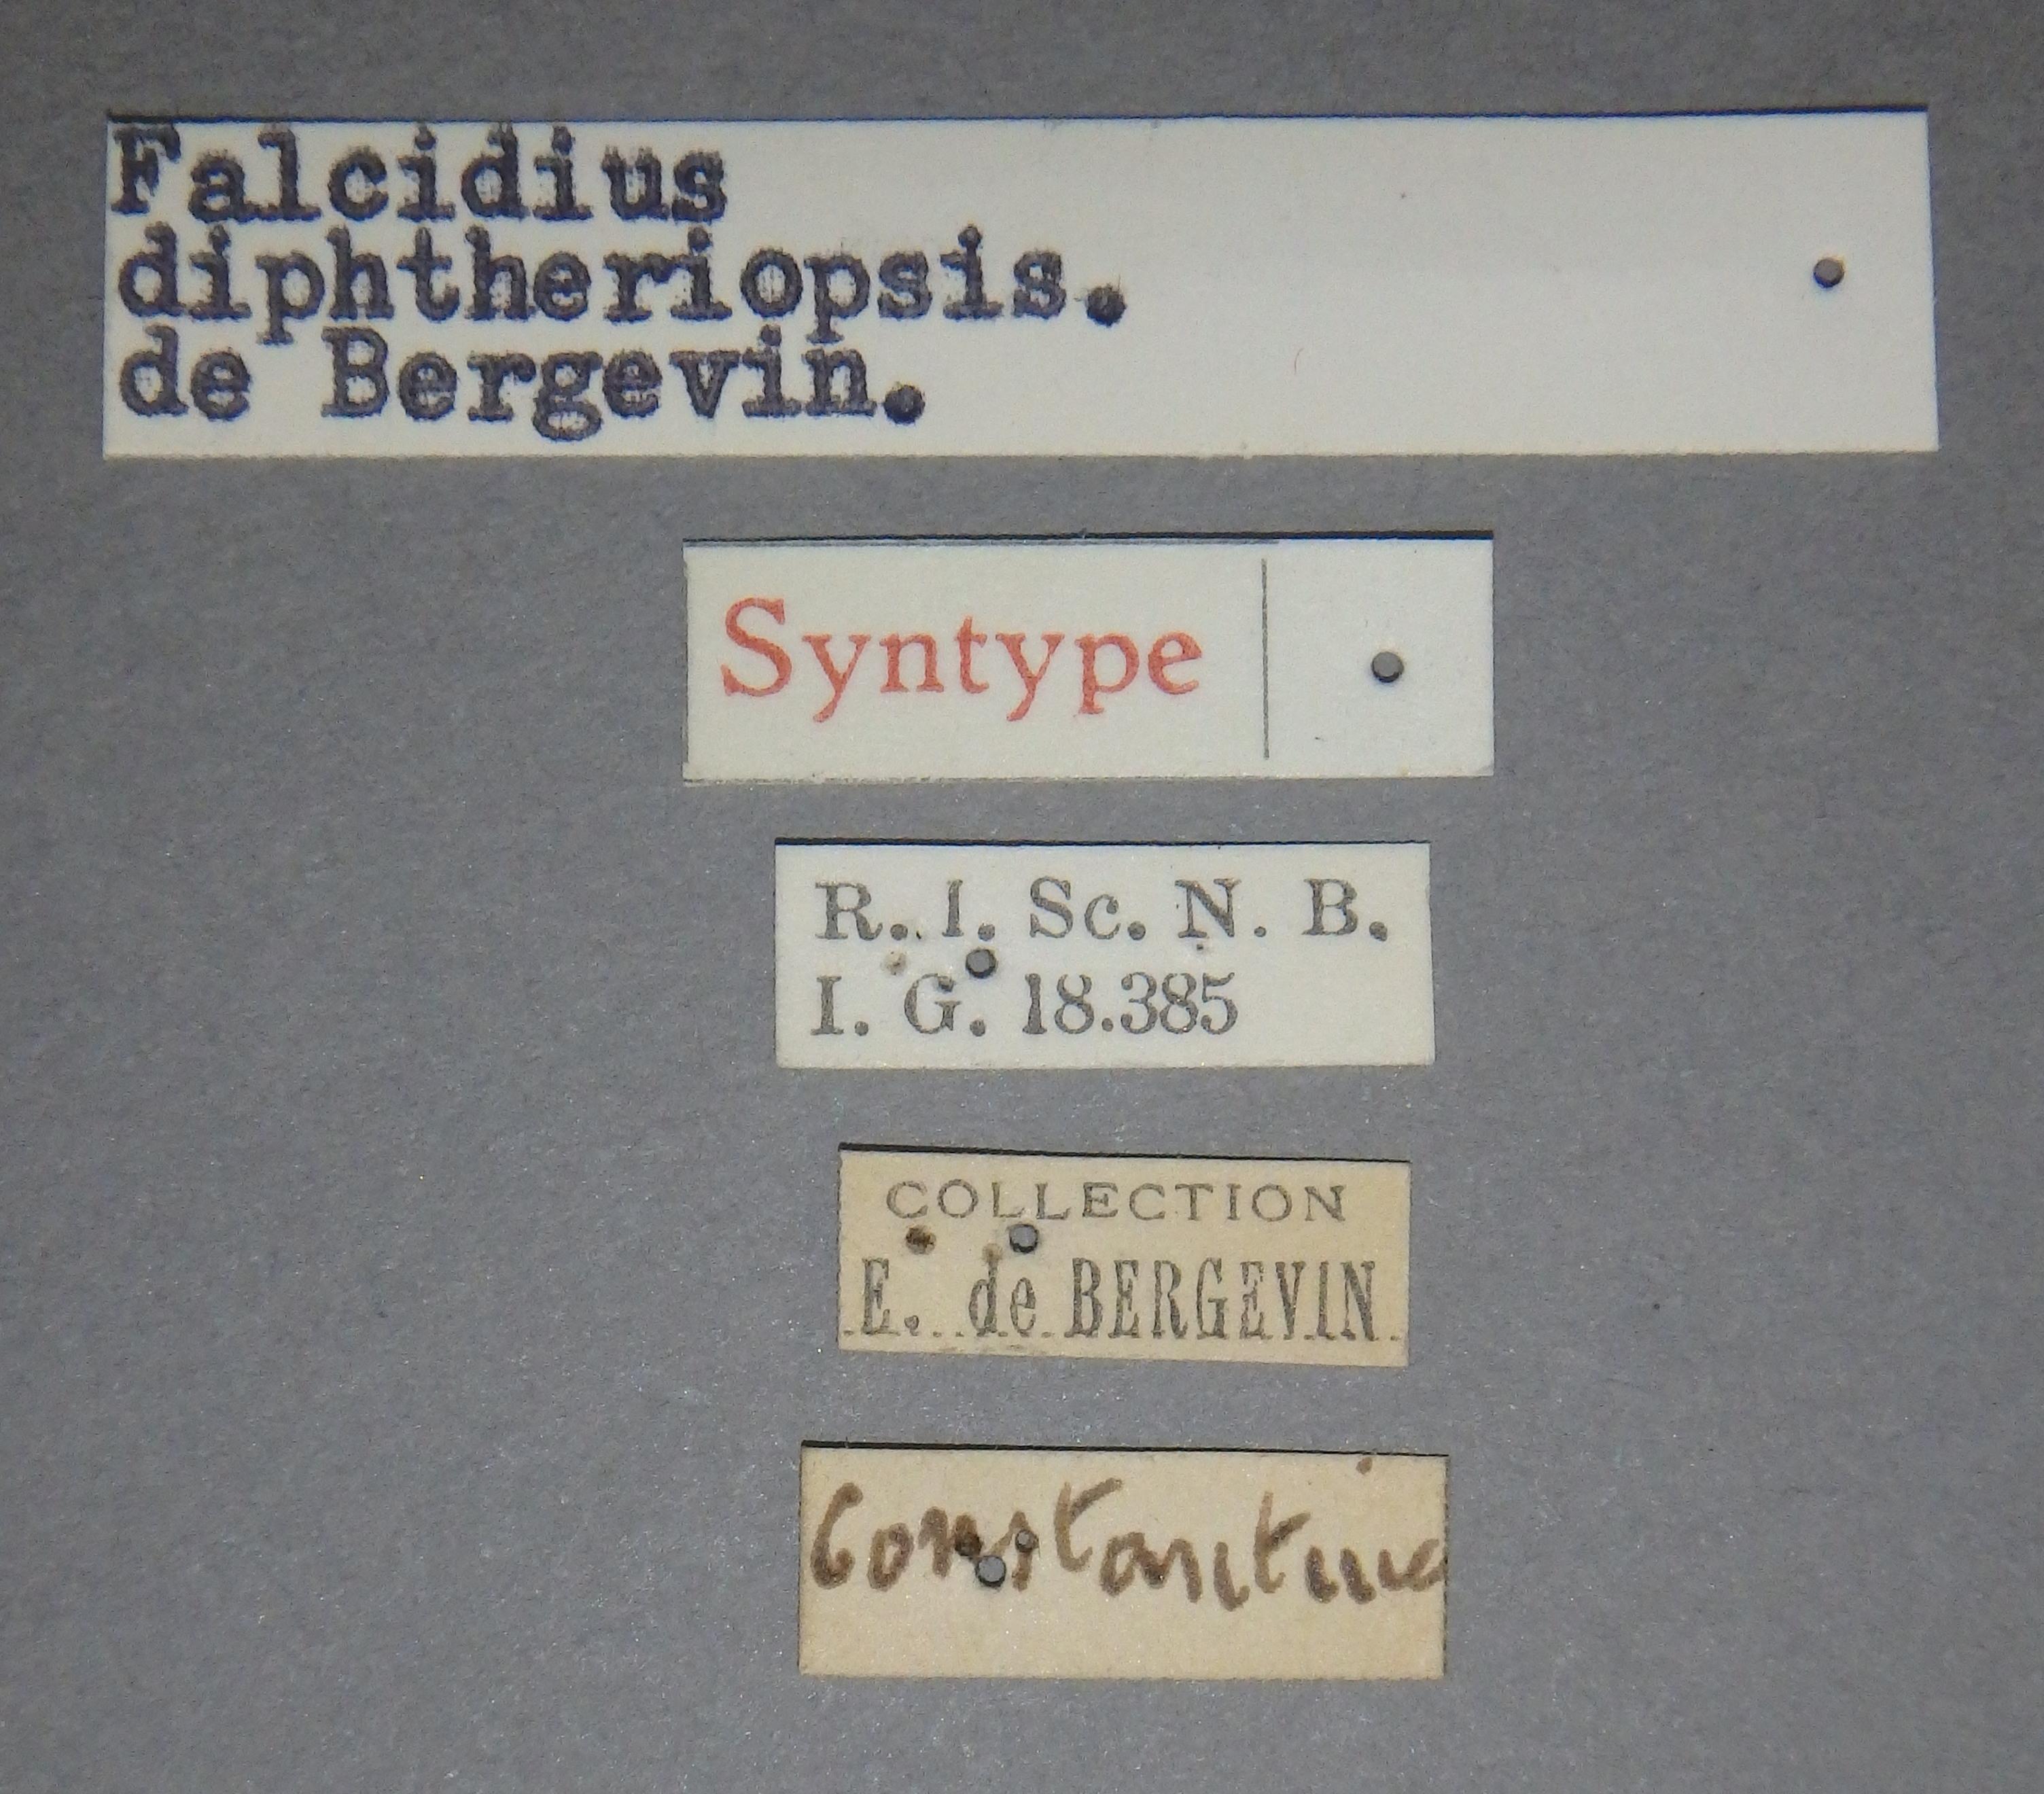 Falcidius diphtheriopsis st2 Lb.JPG